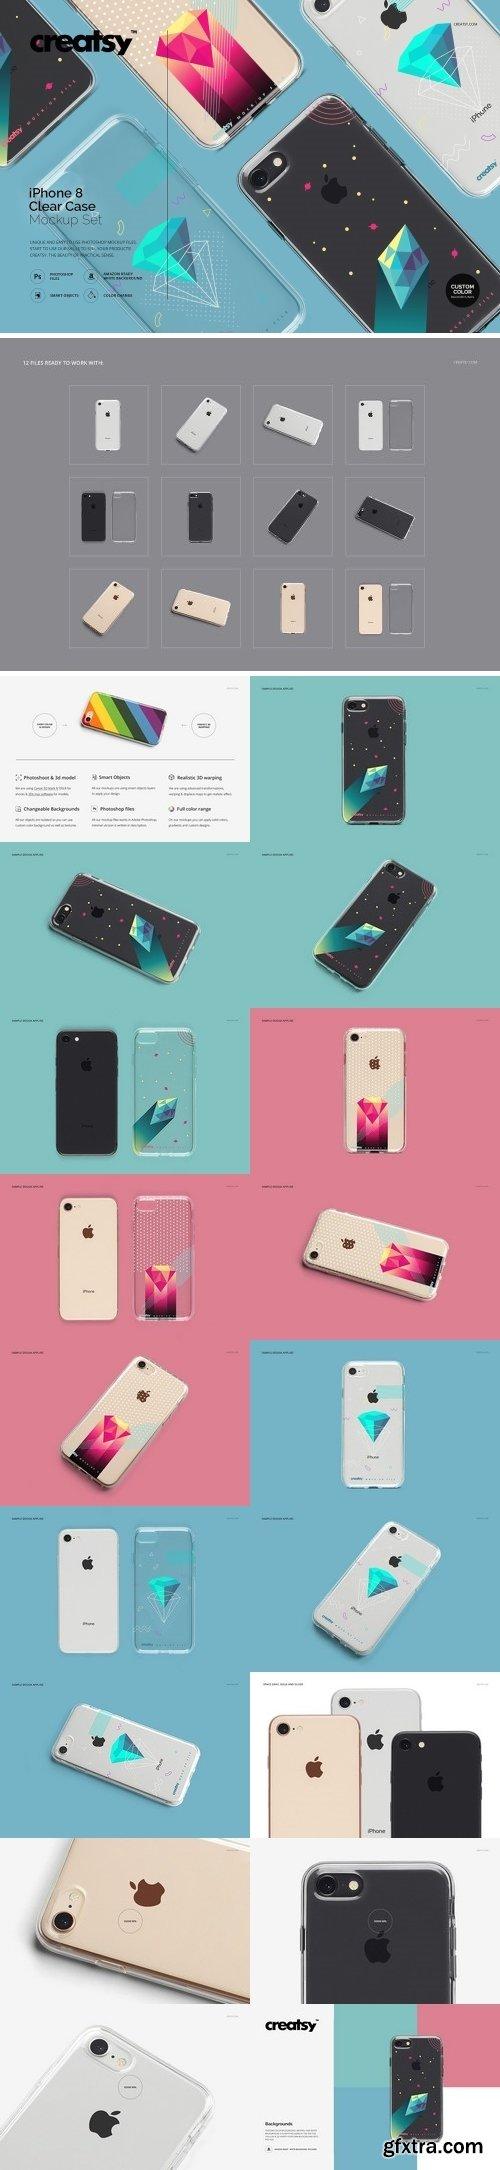 CM - iPhone 8 Clear Case Mockup Set 2170983